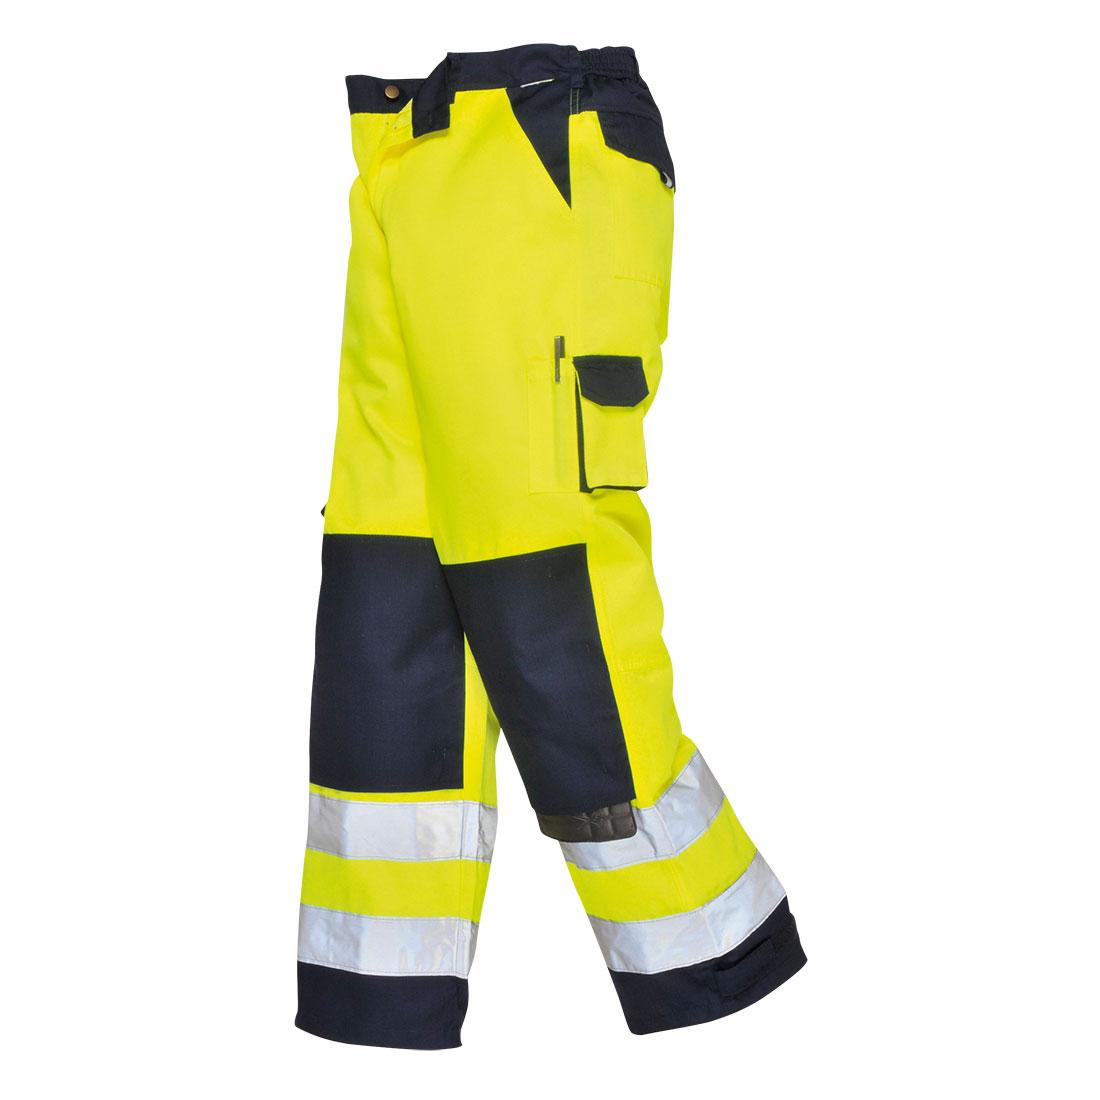 Portwest Texo Lyon Hi-Vis Trousers (Geel/Navy) 3XL